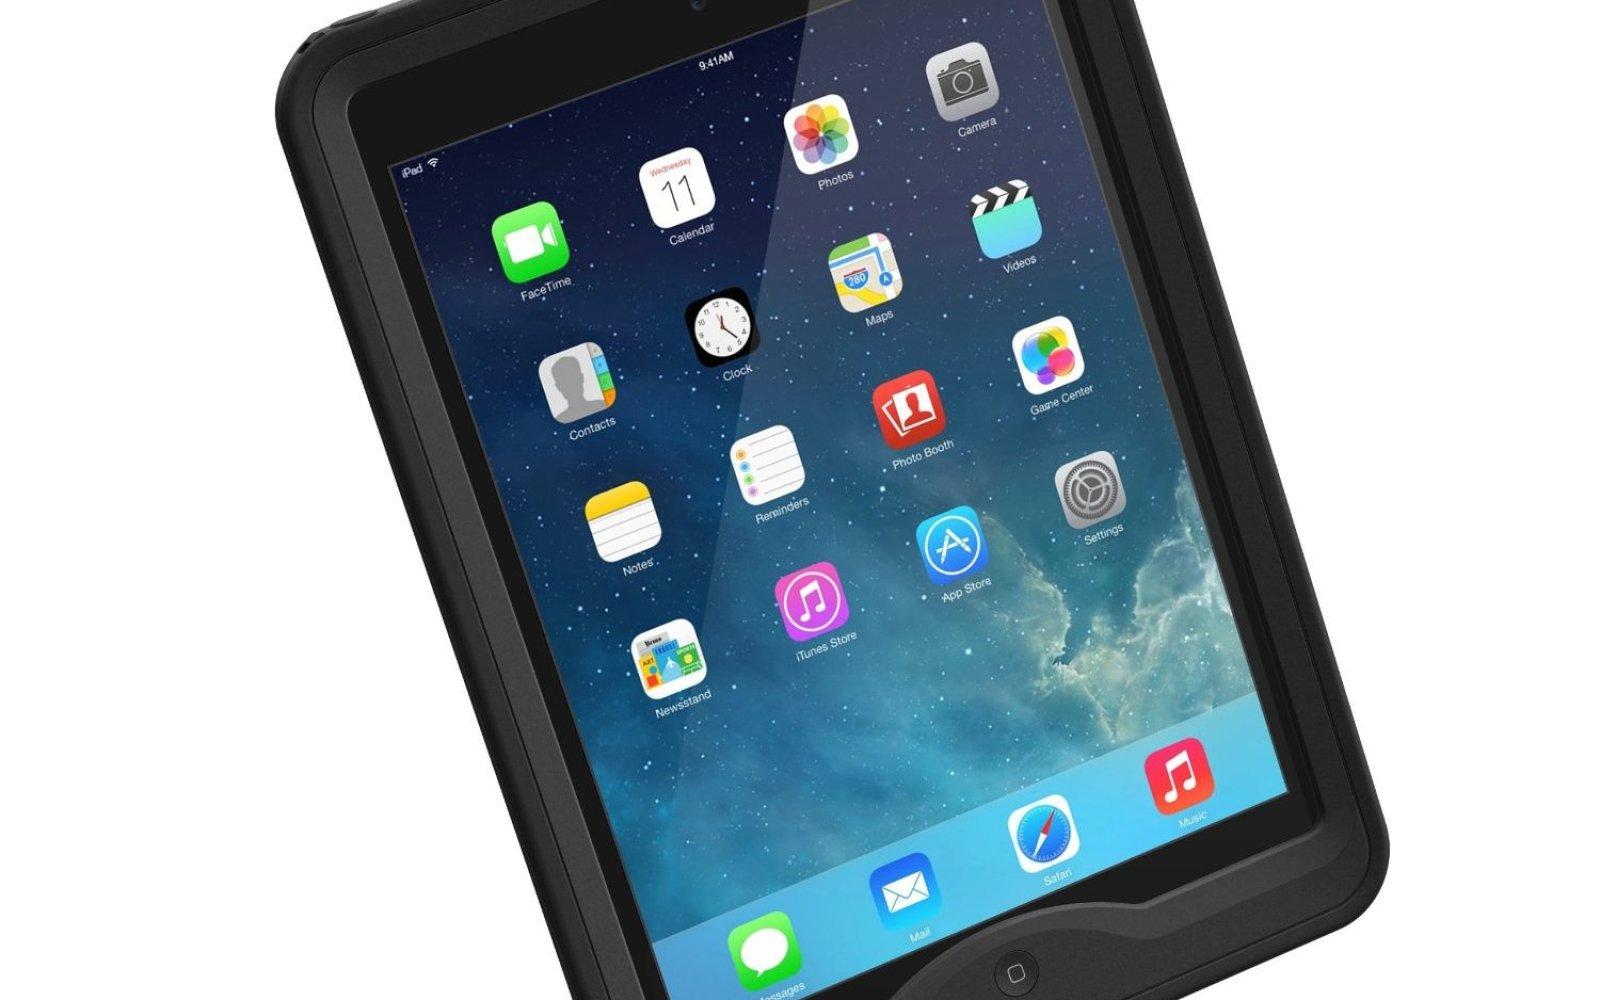 Lifeproof water/shock proof nüüd case for iPad Air $68 shipped (Reg. $130)